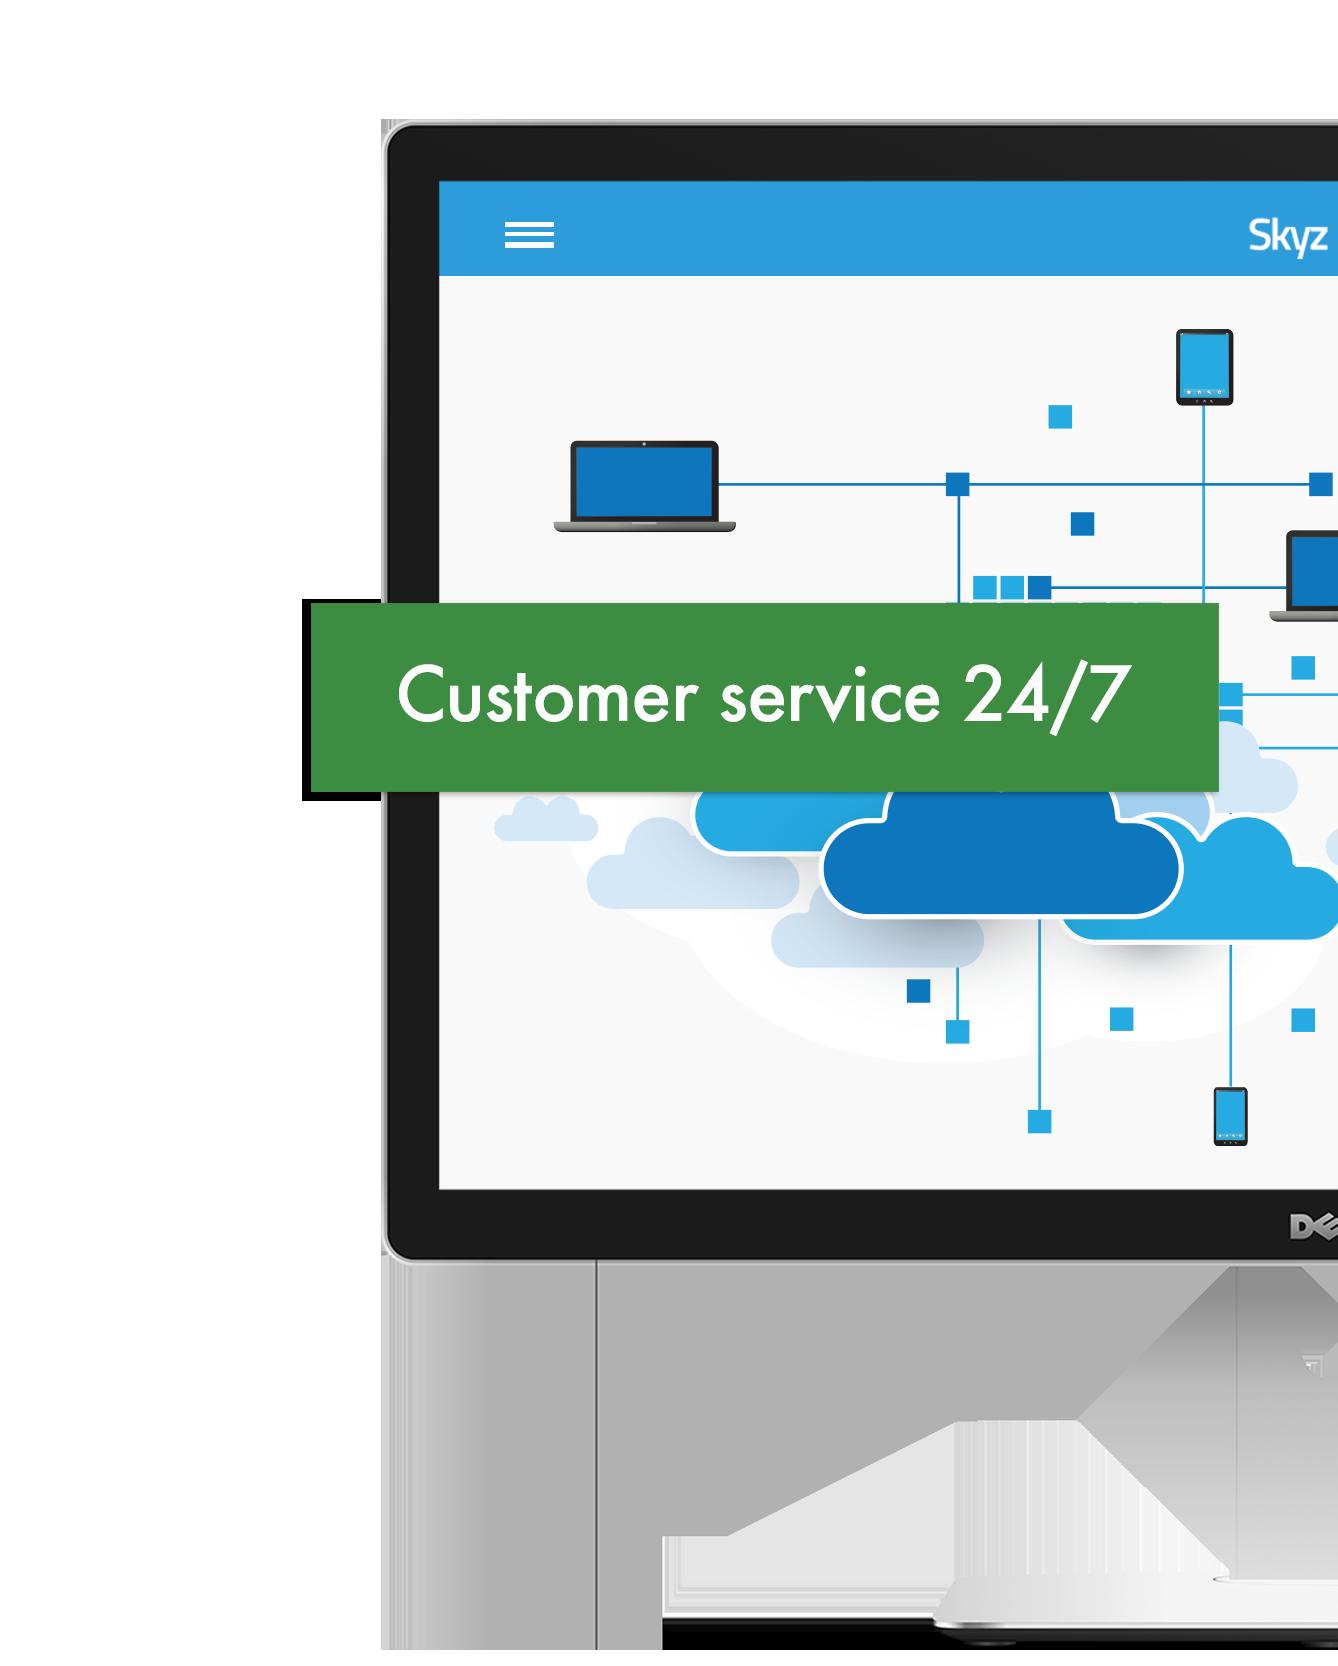 Skyz Service cloud technology